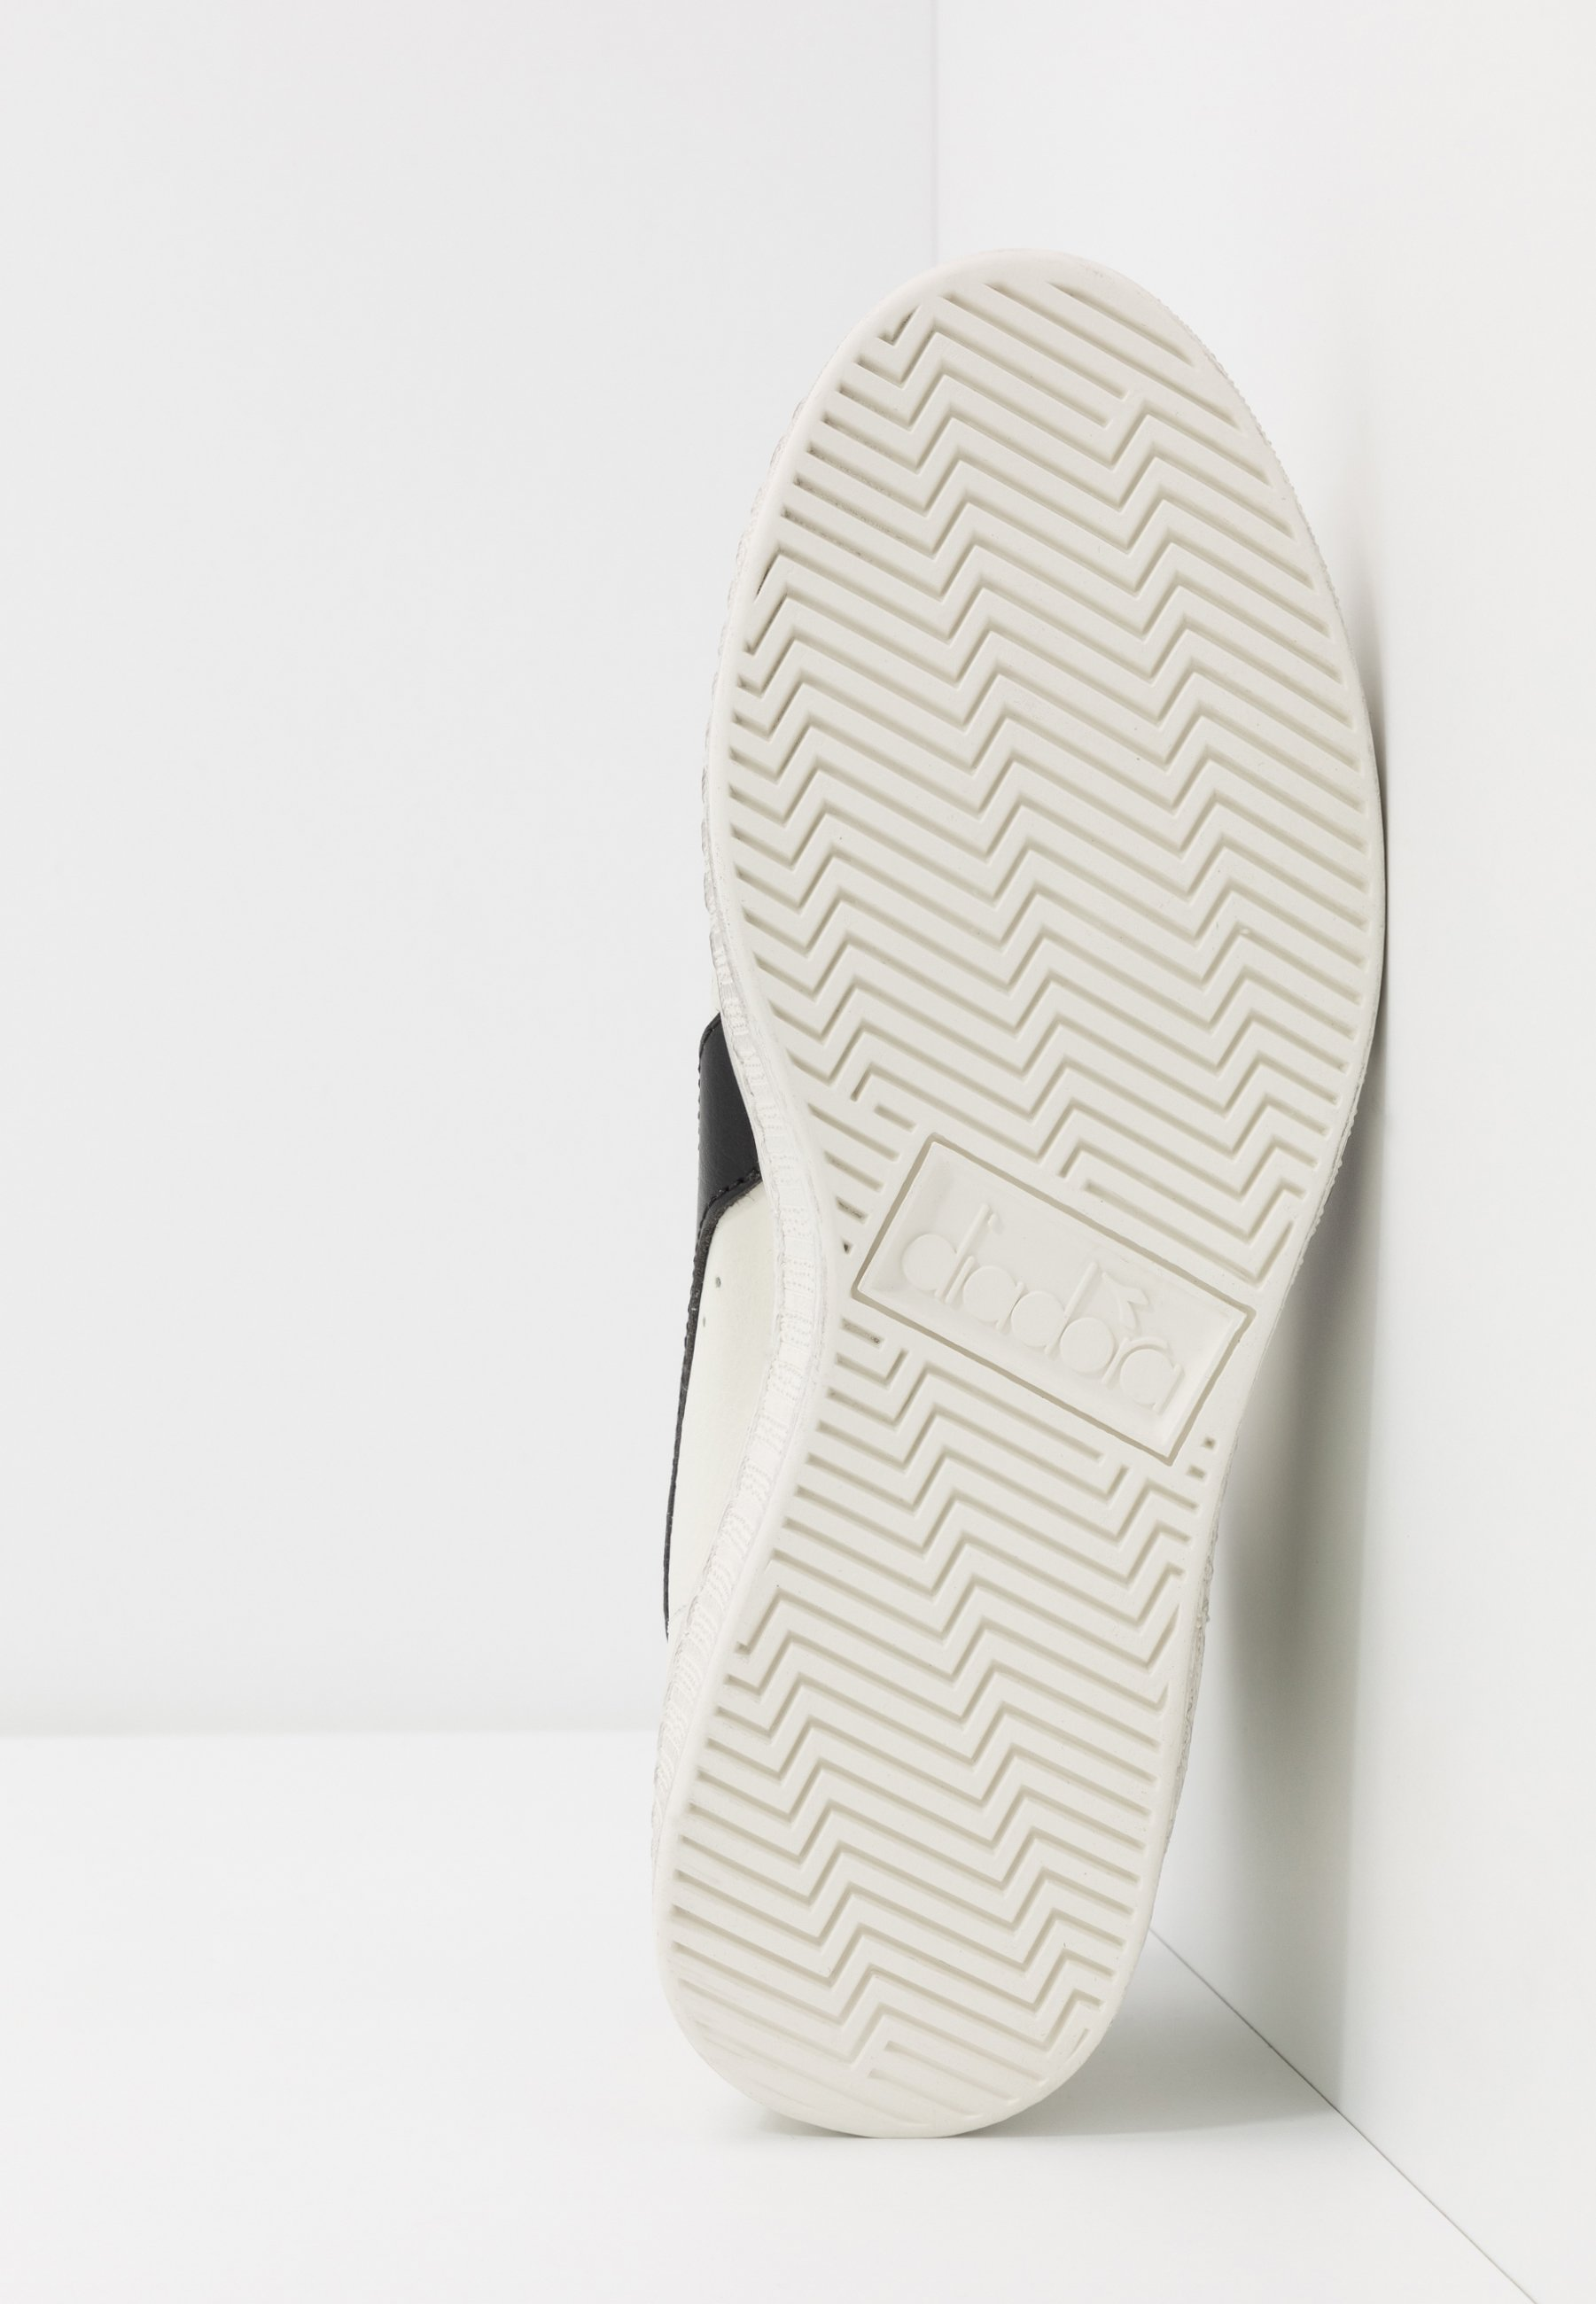 Diadora GAME WAXED - Sneaker high - white/black/weiß - Herrenschuhe 2jHnn